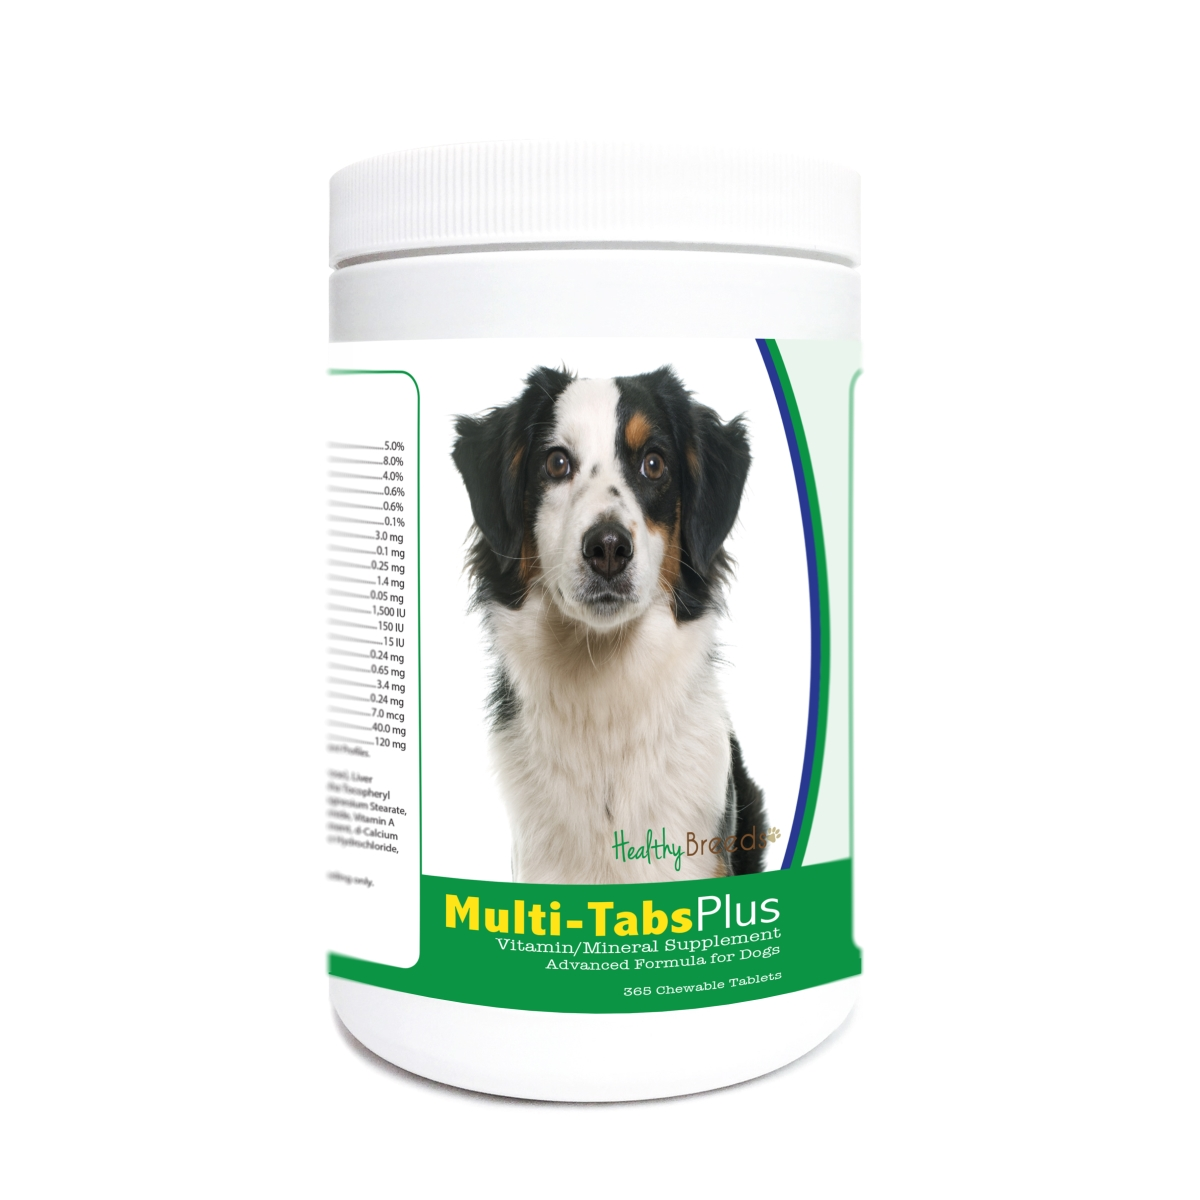 Healthy Breeds 840235182092 Miniature American Shepherd Multi-Tabs Plus Chewable Tablets - 365 Count